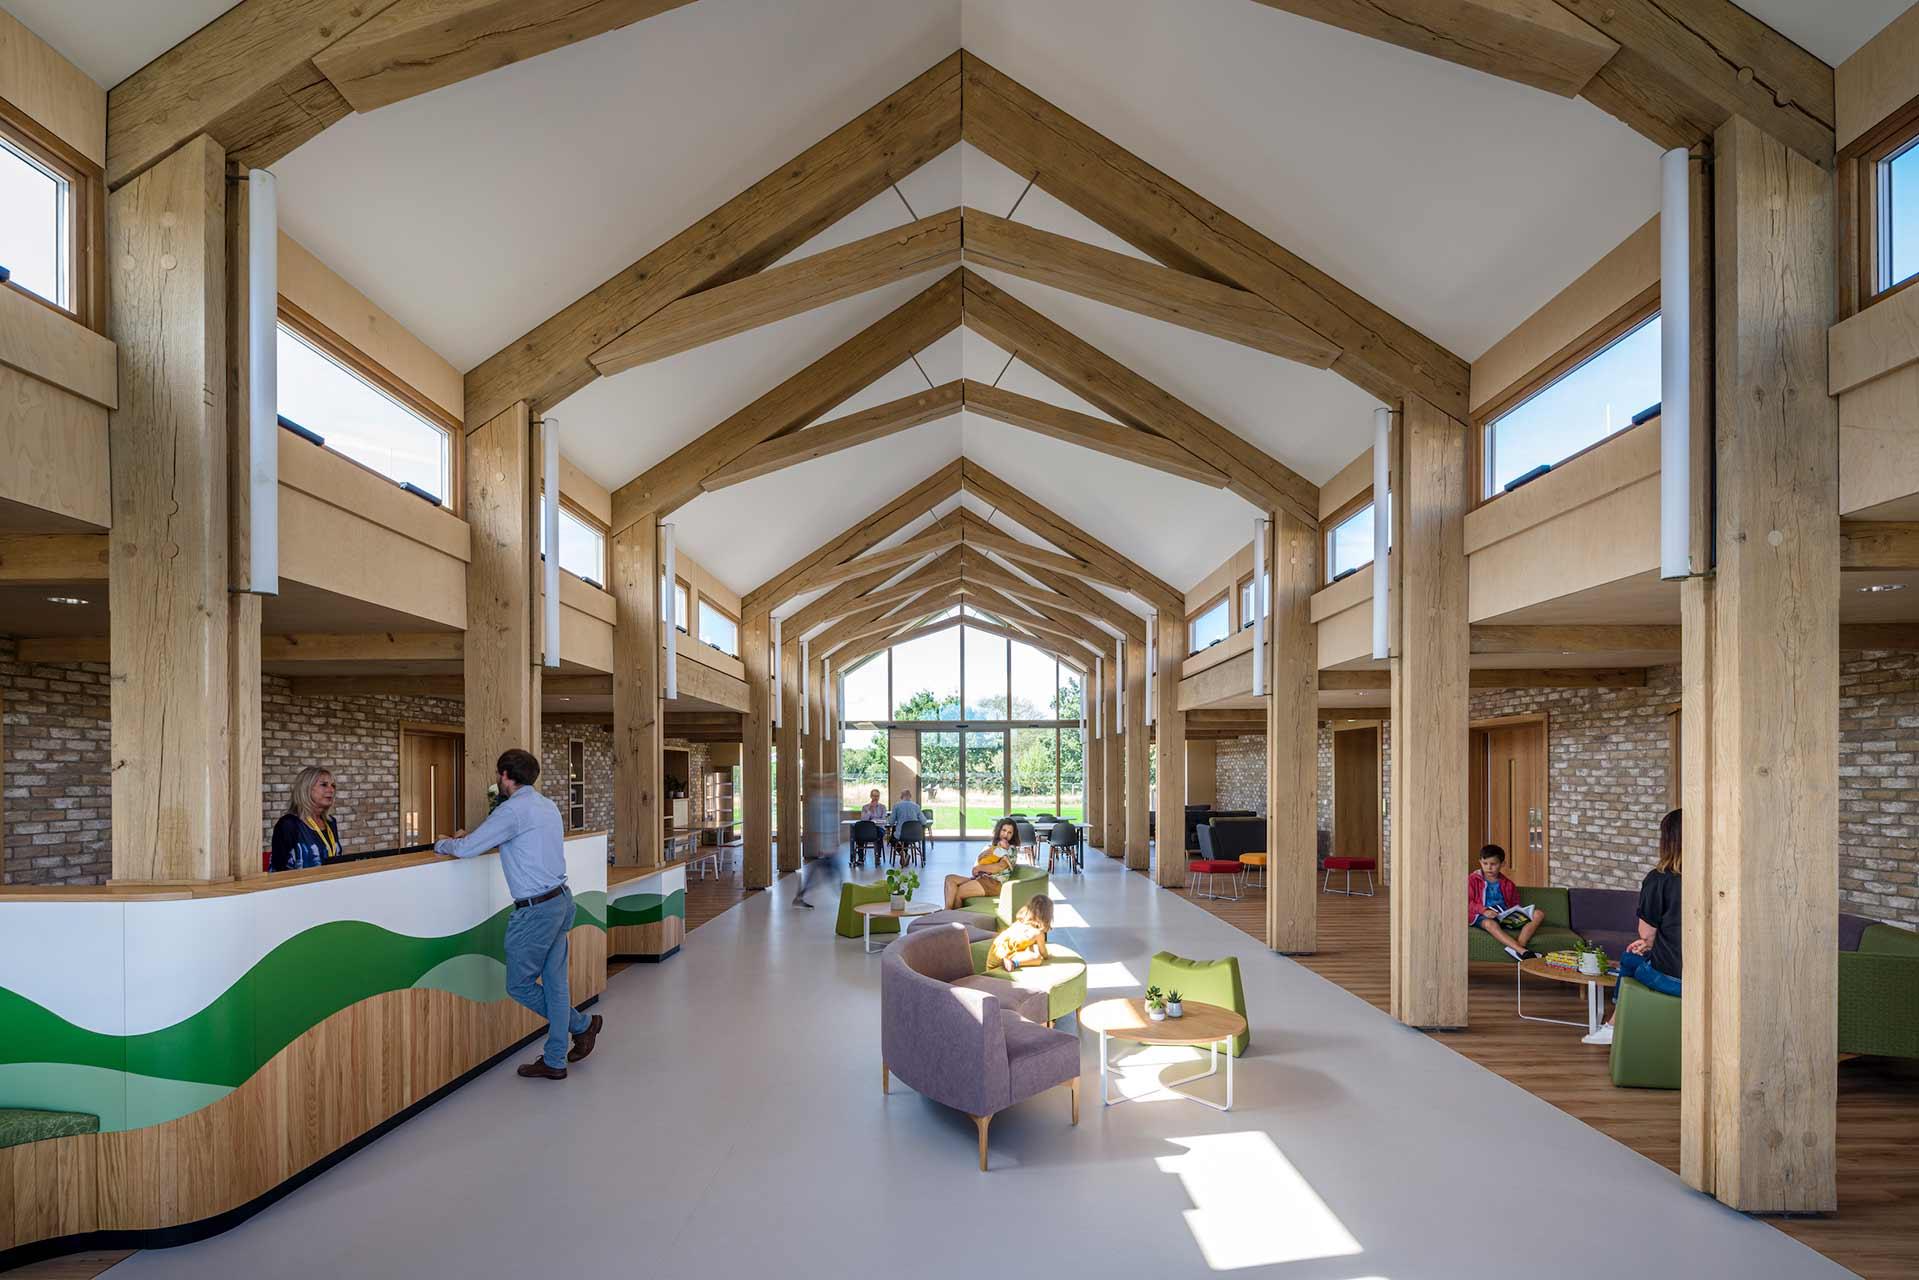 Noah's Ark Children's Hospice interior